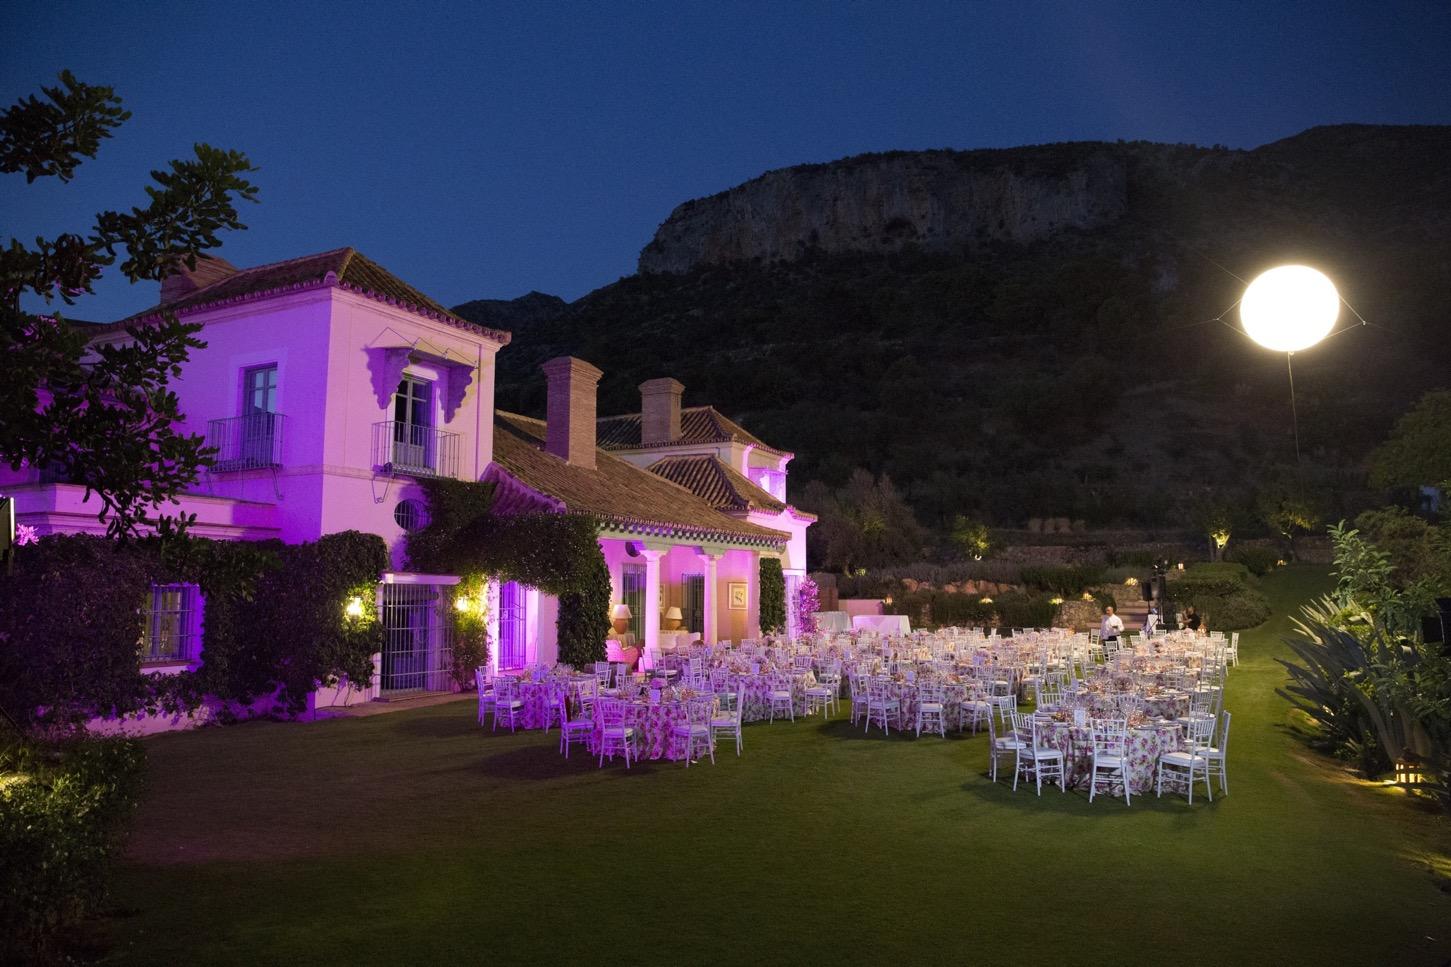 Si-Quiero-Wedding-Planner-By-Sira-Antequera-Sonia-Carlos-12